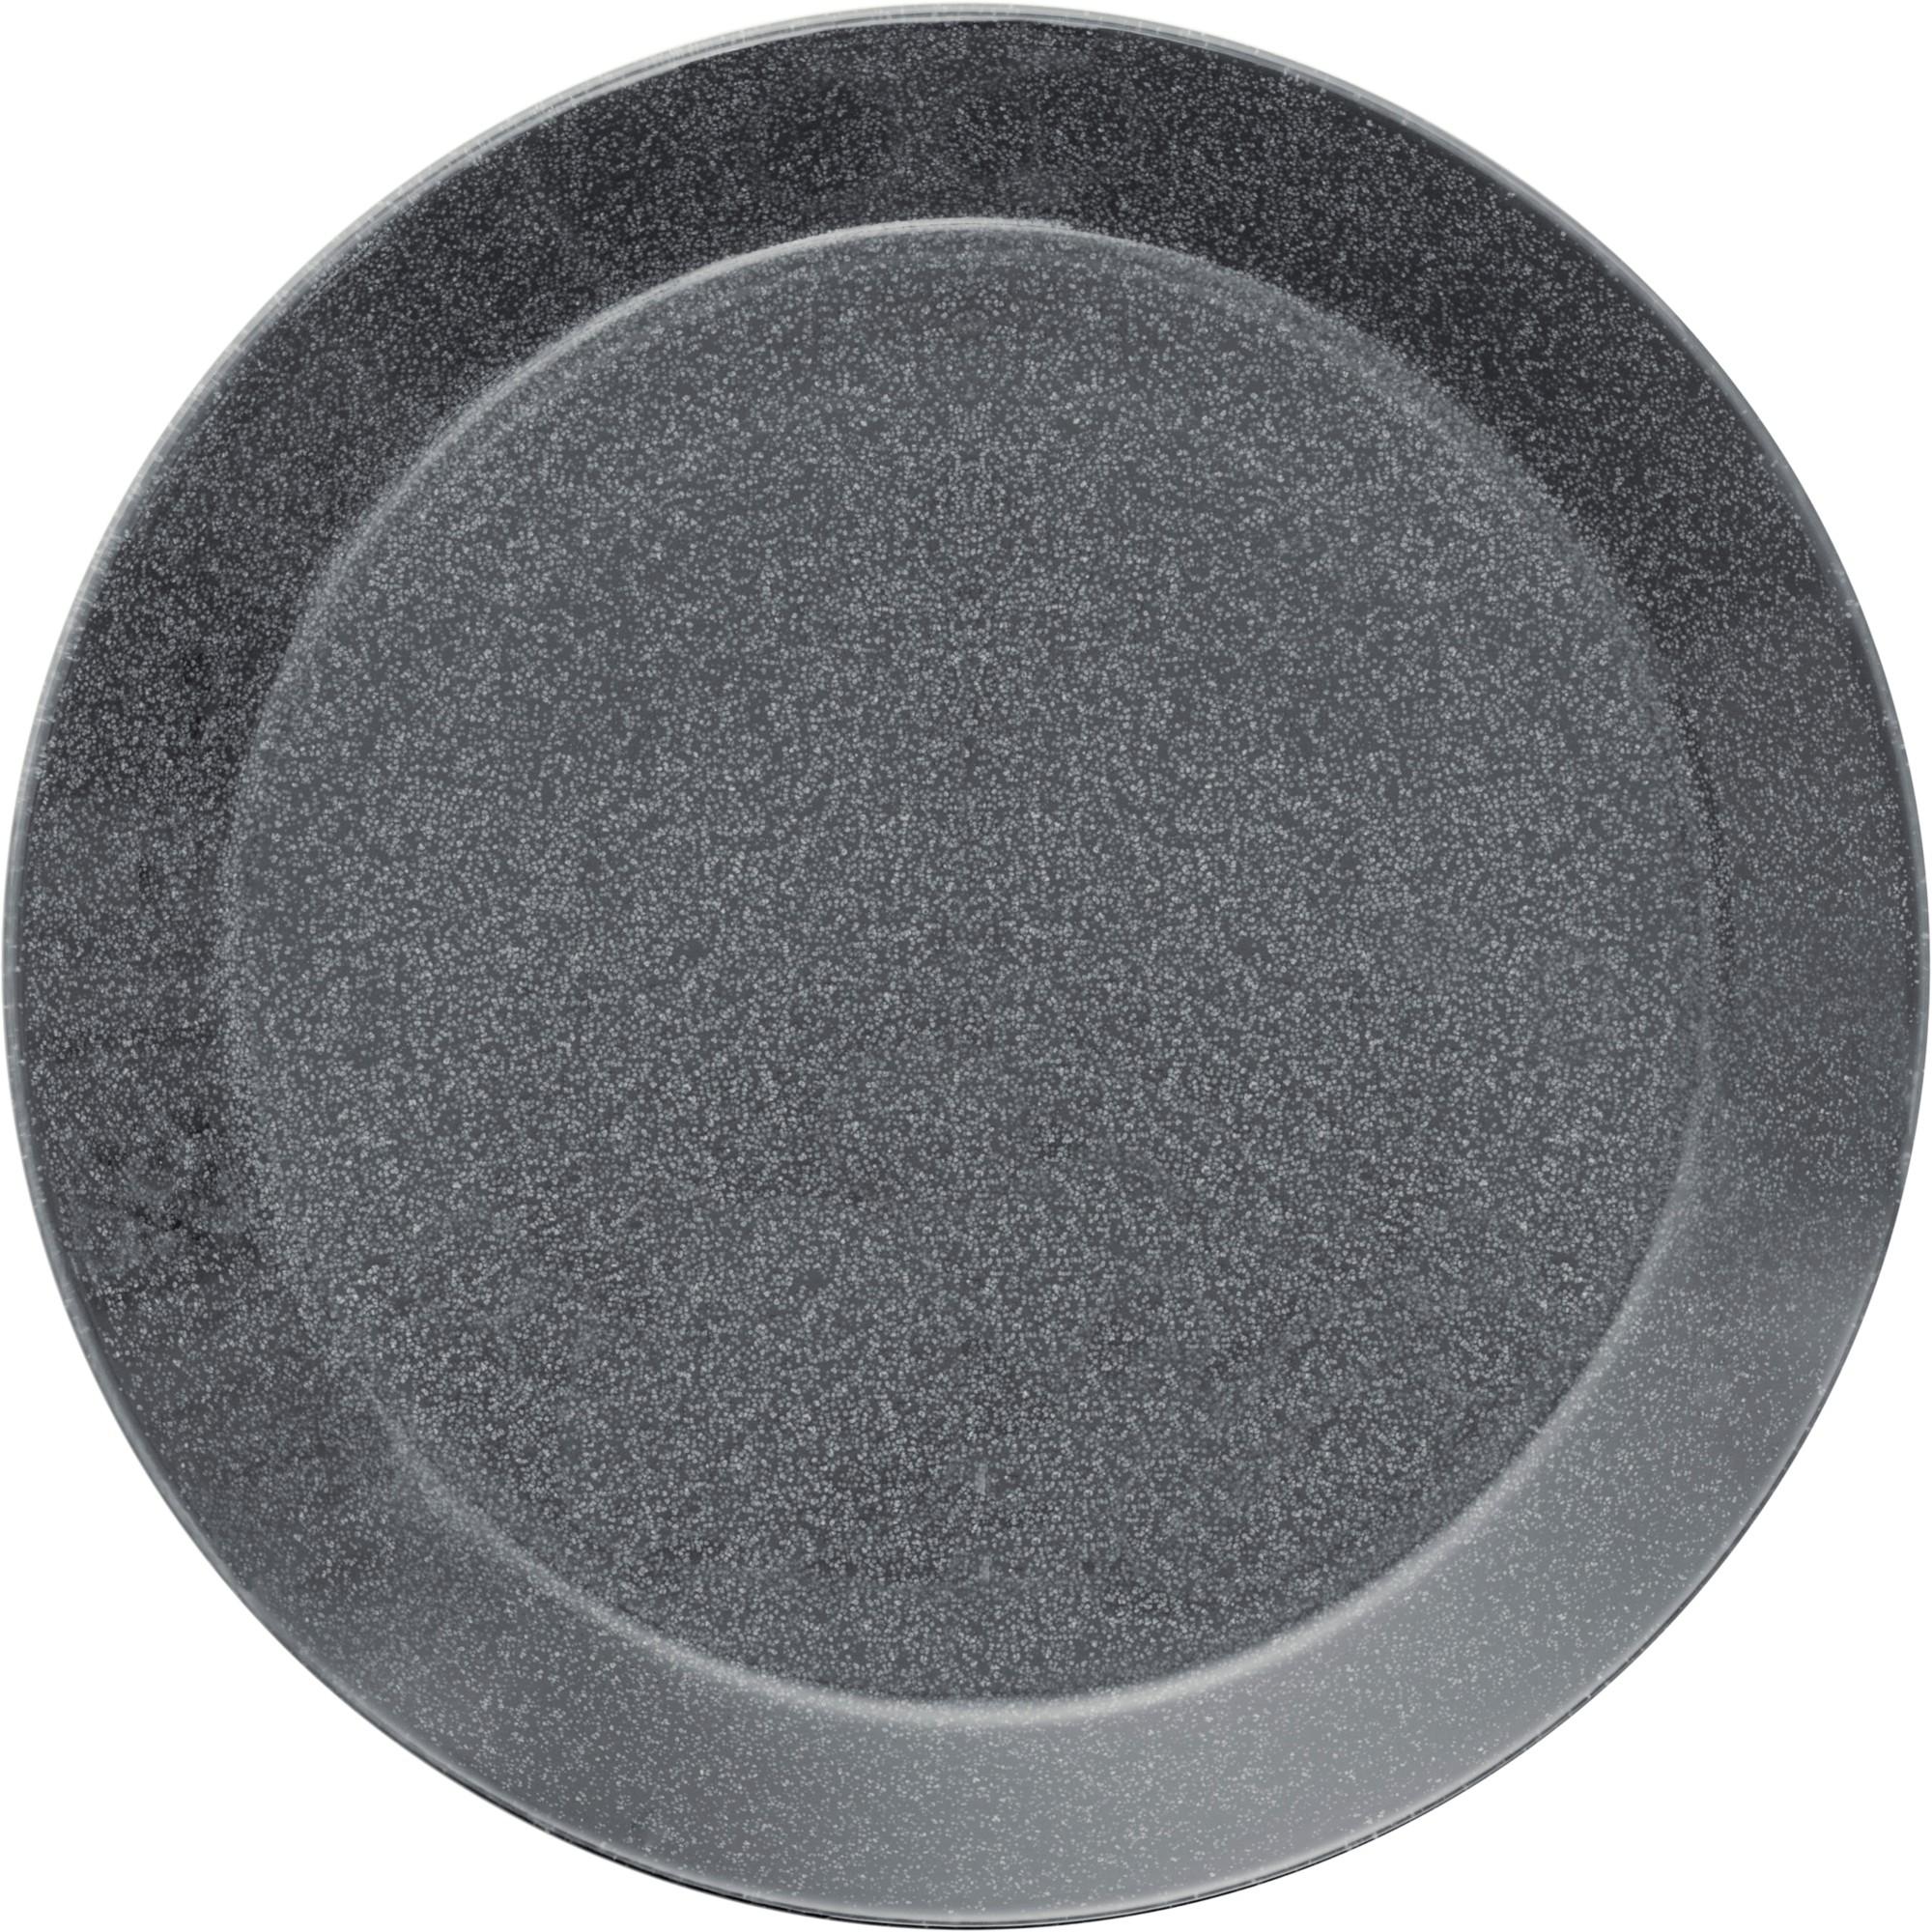 iittala teema plate 26 cm dotted grey iittala com uk